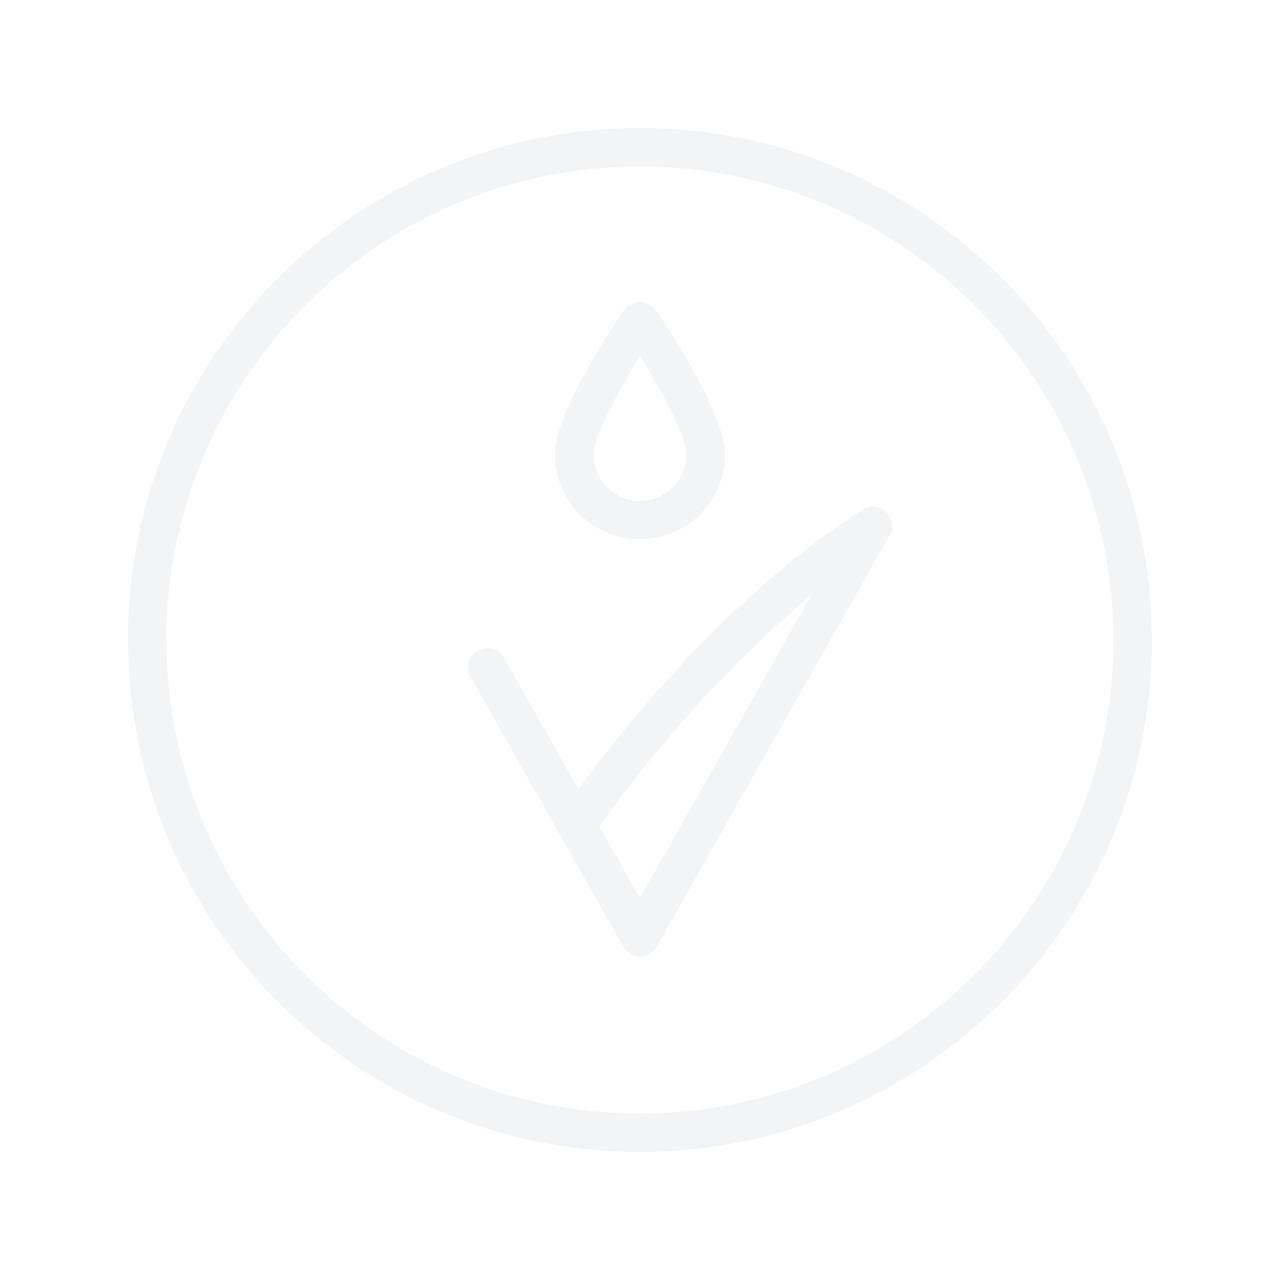 WELLA PROFESSIONALS Invigo Volume Bodifying Shampoo 50ml